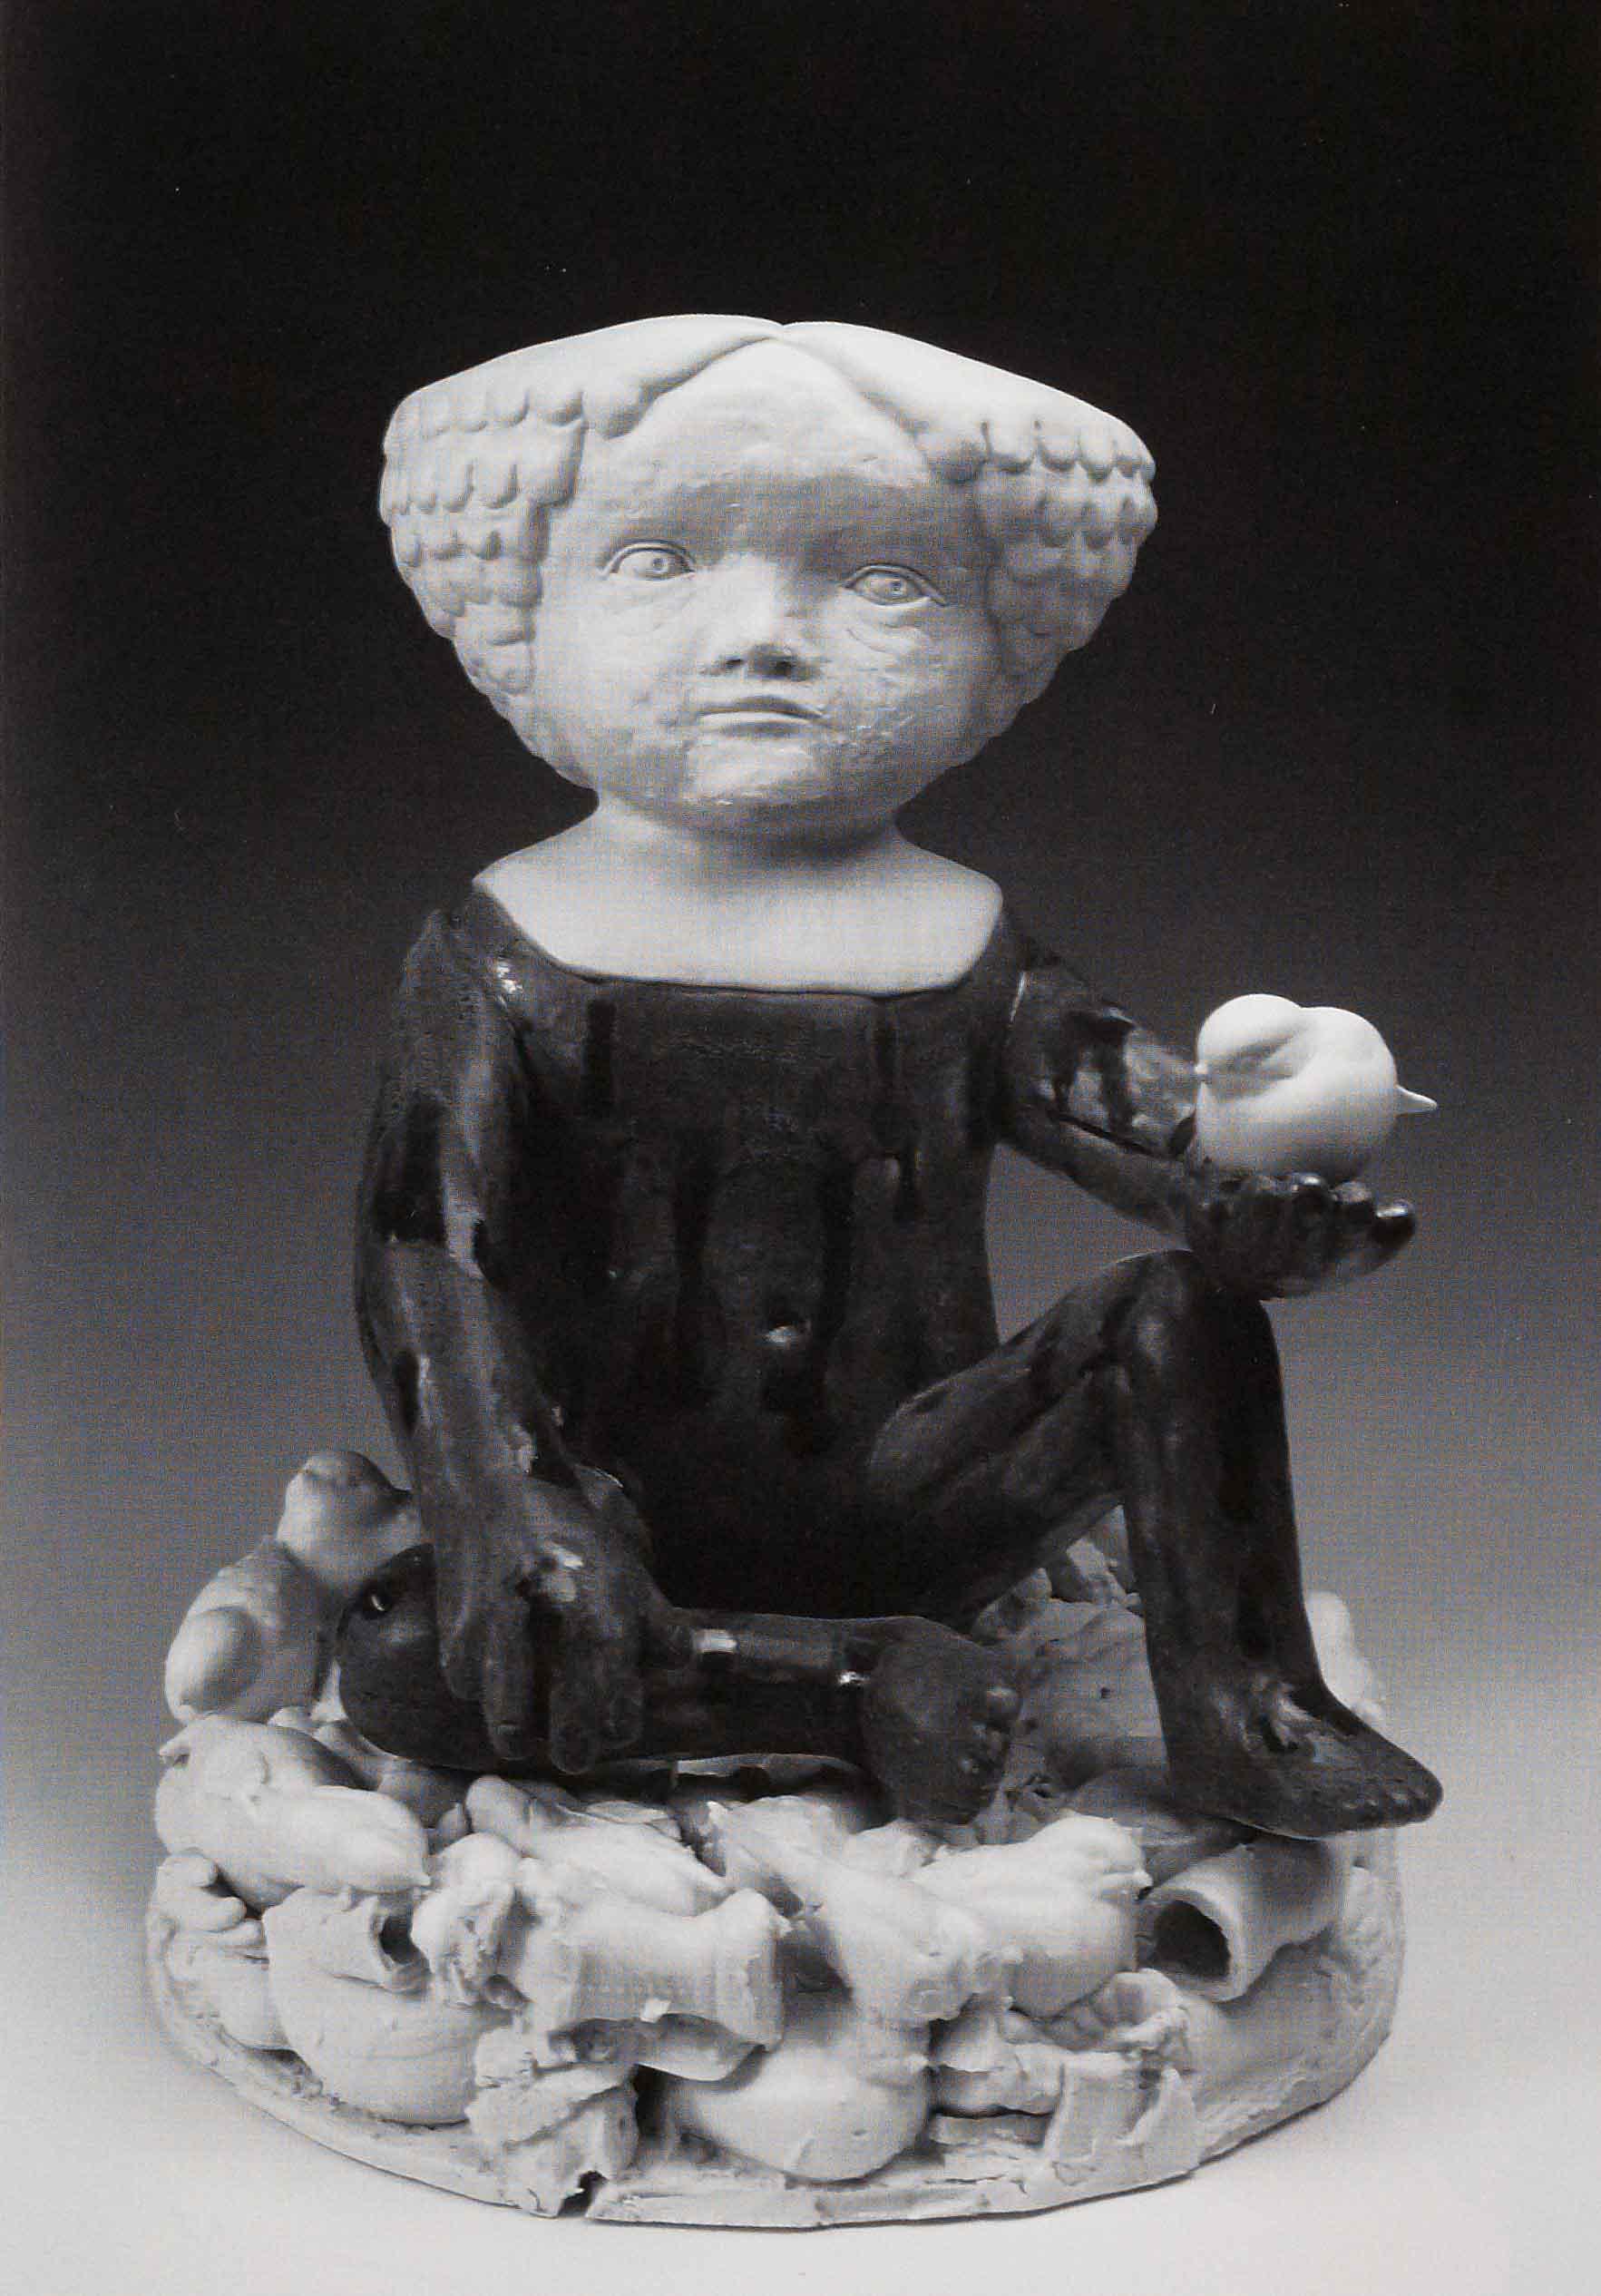 Ascendant, 2008. Porcelain. 24 x 13 in.